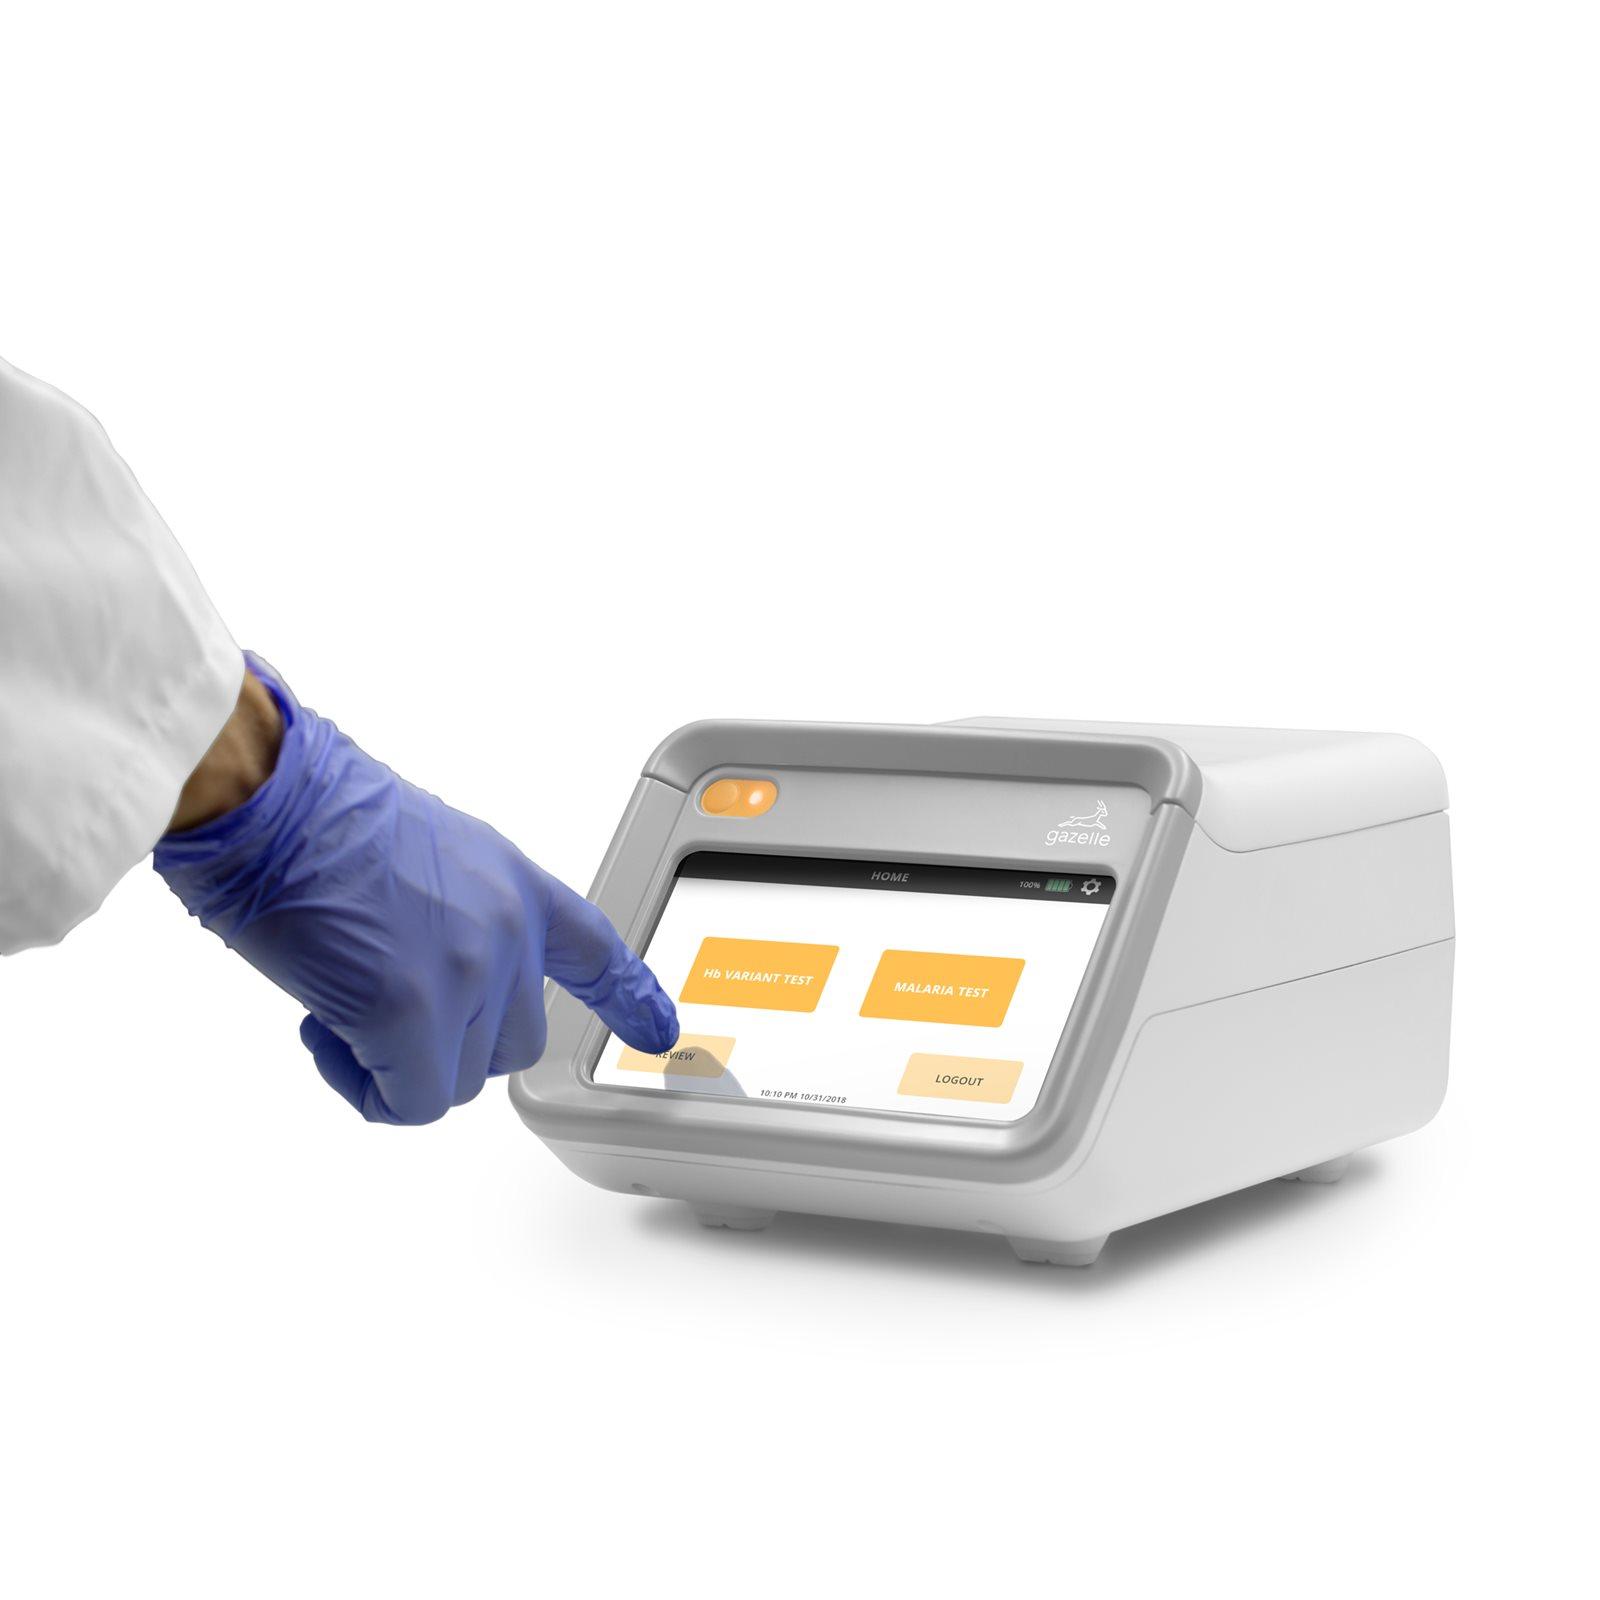 Case Western Reserve University Licenses Rapid Malaria, Hemoglobin Disorder Tests